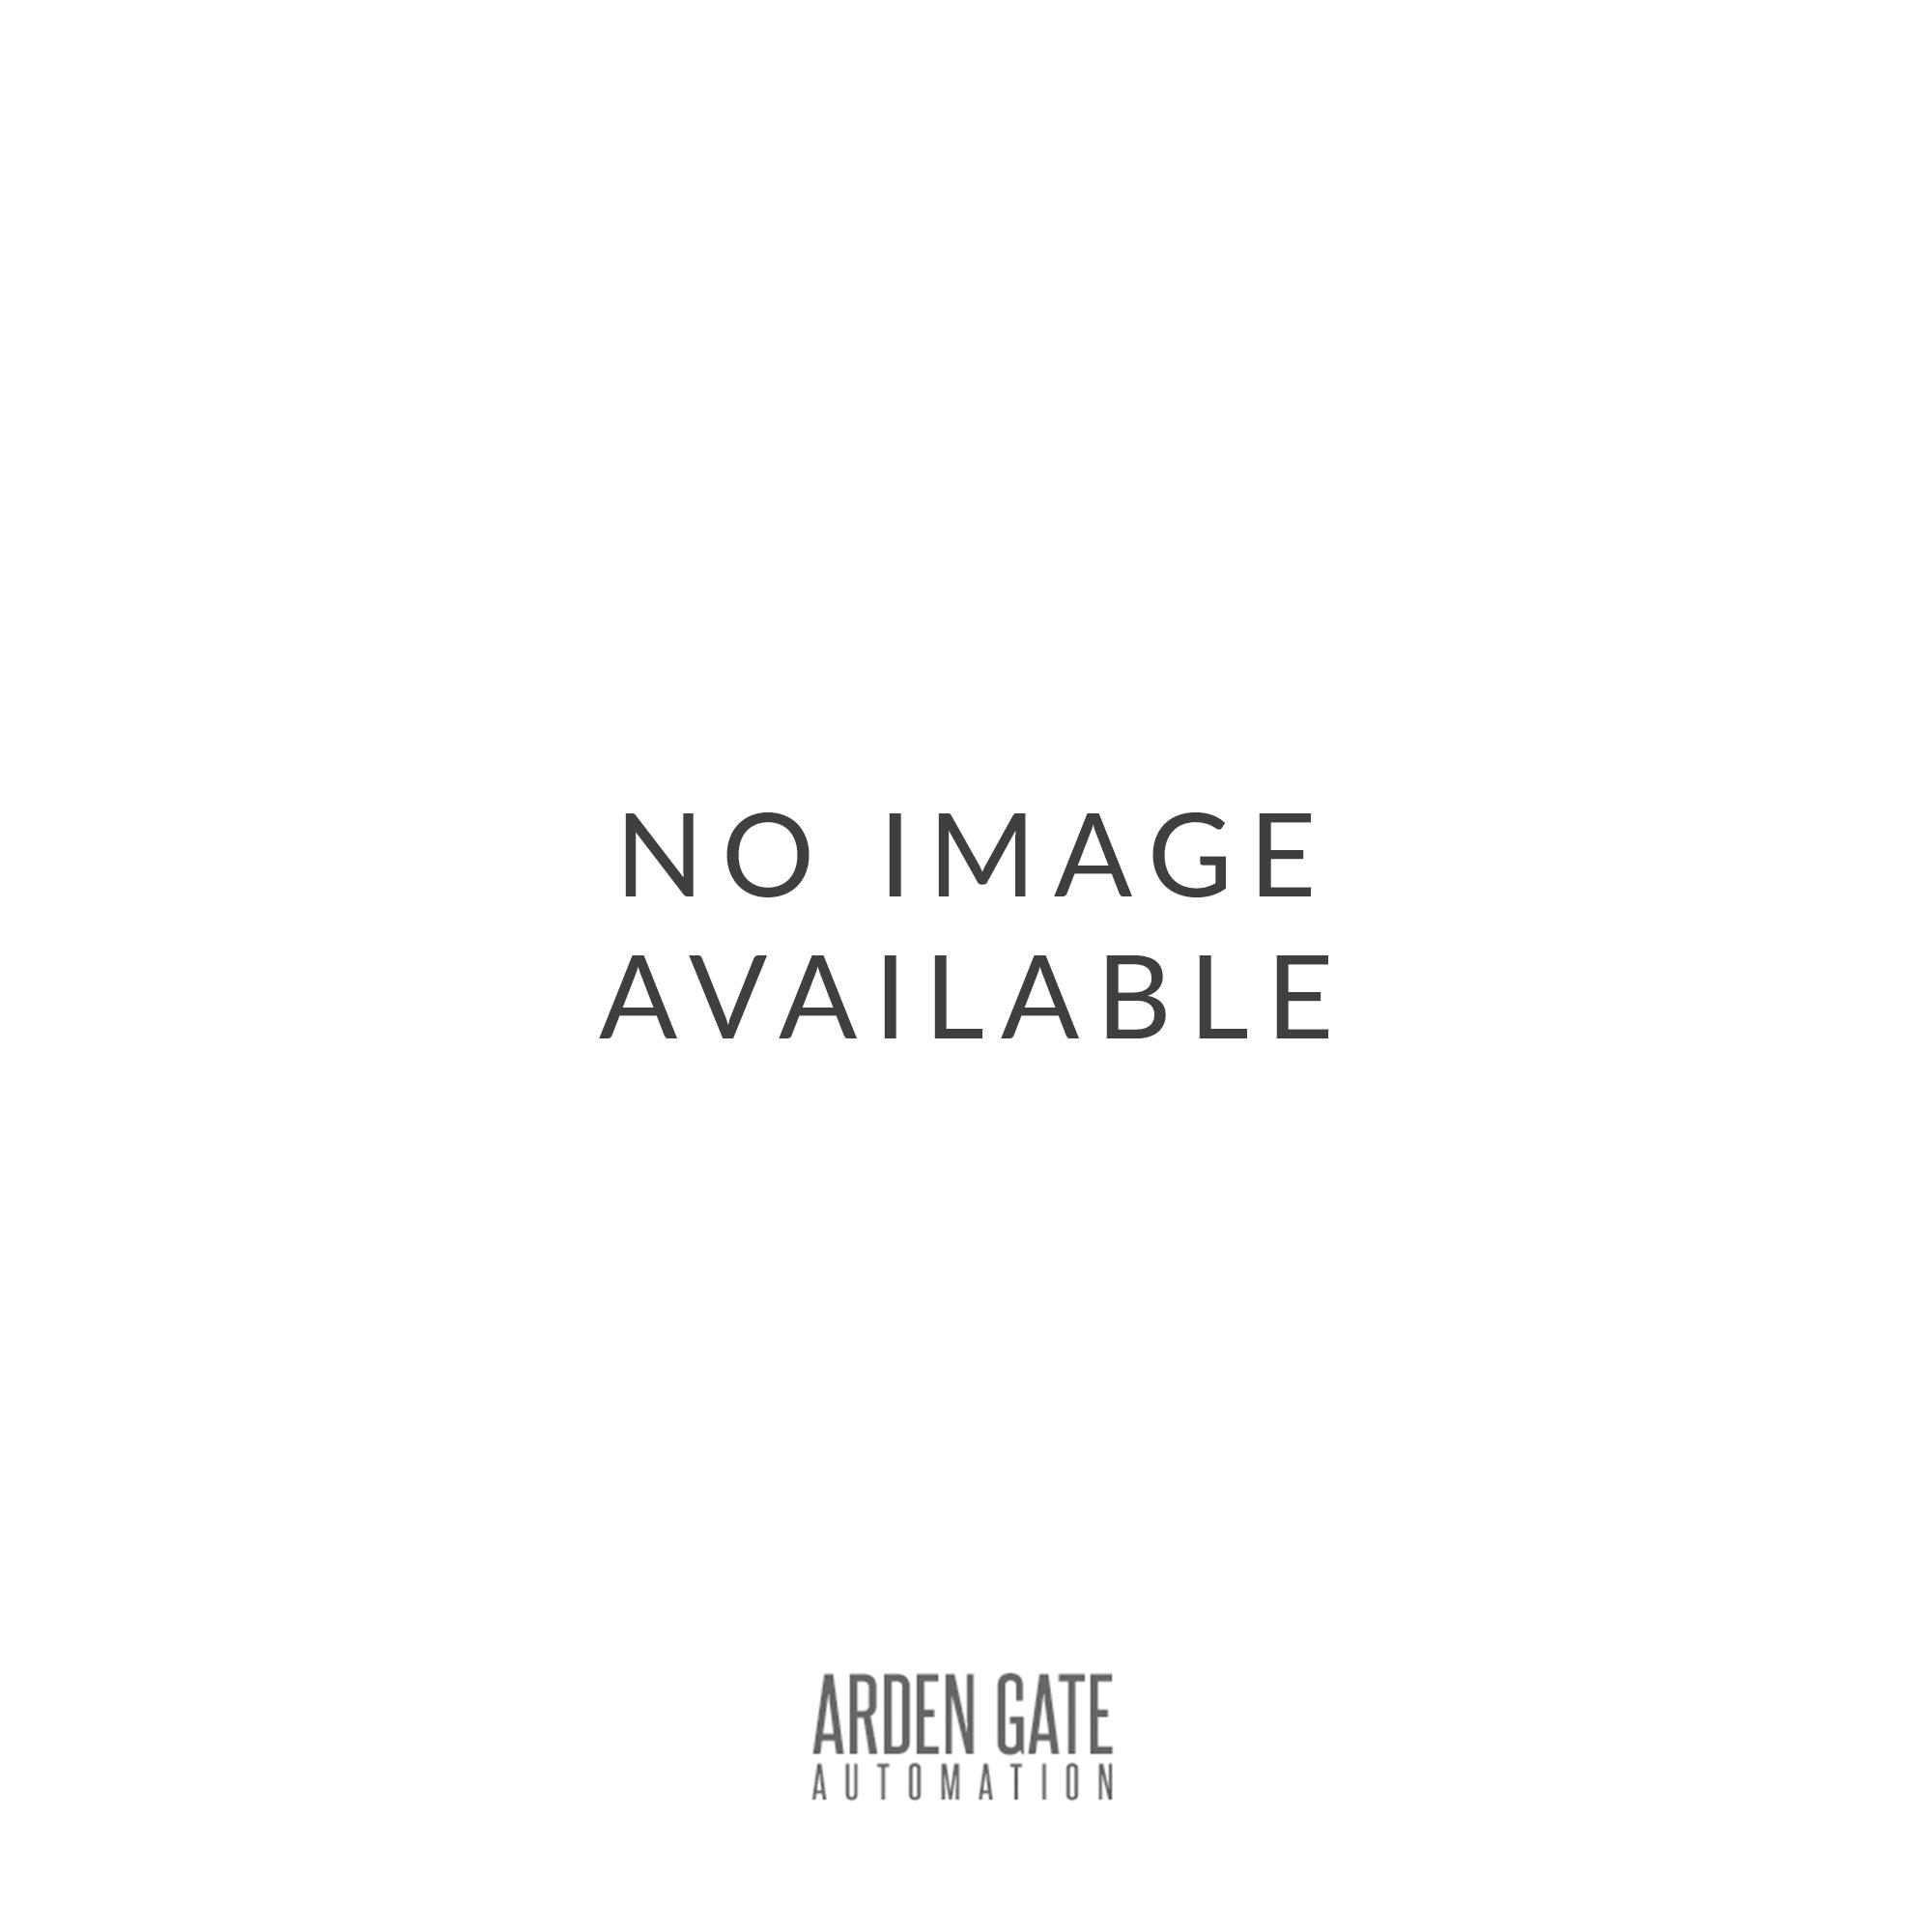 740 D control board